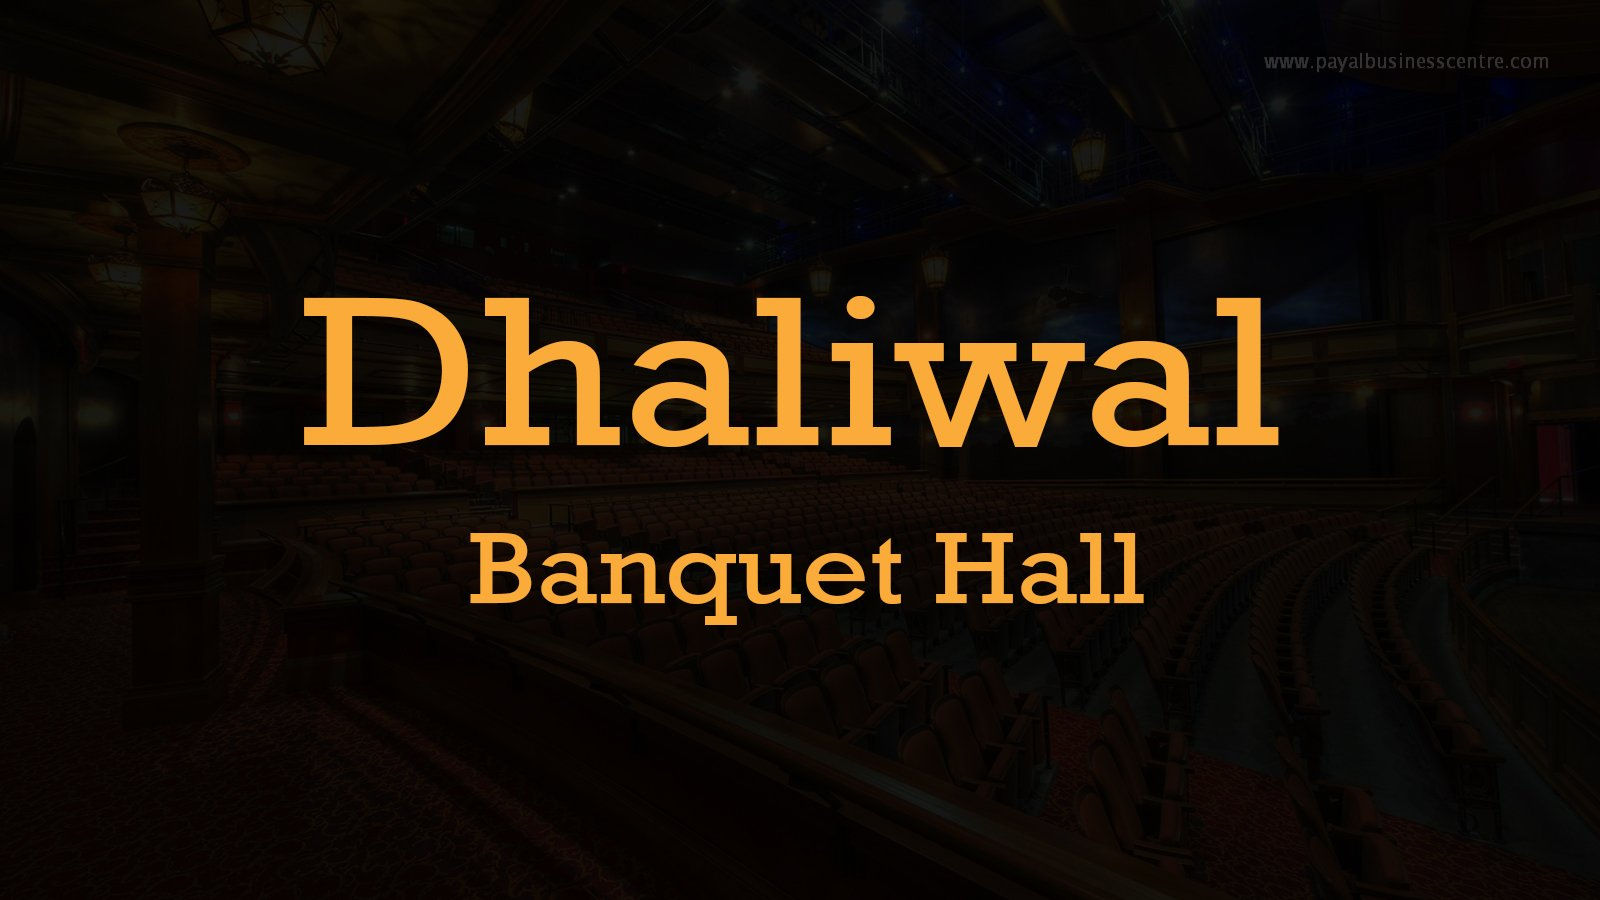 Dhaliwal Banquet Hall - Banquet Halls - 8166 128 St